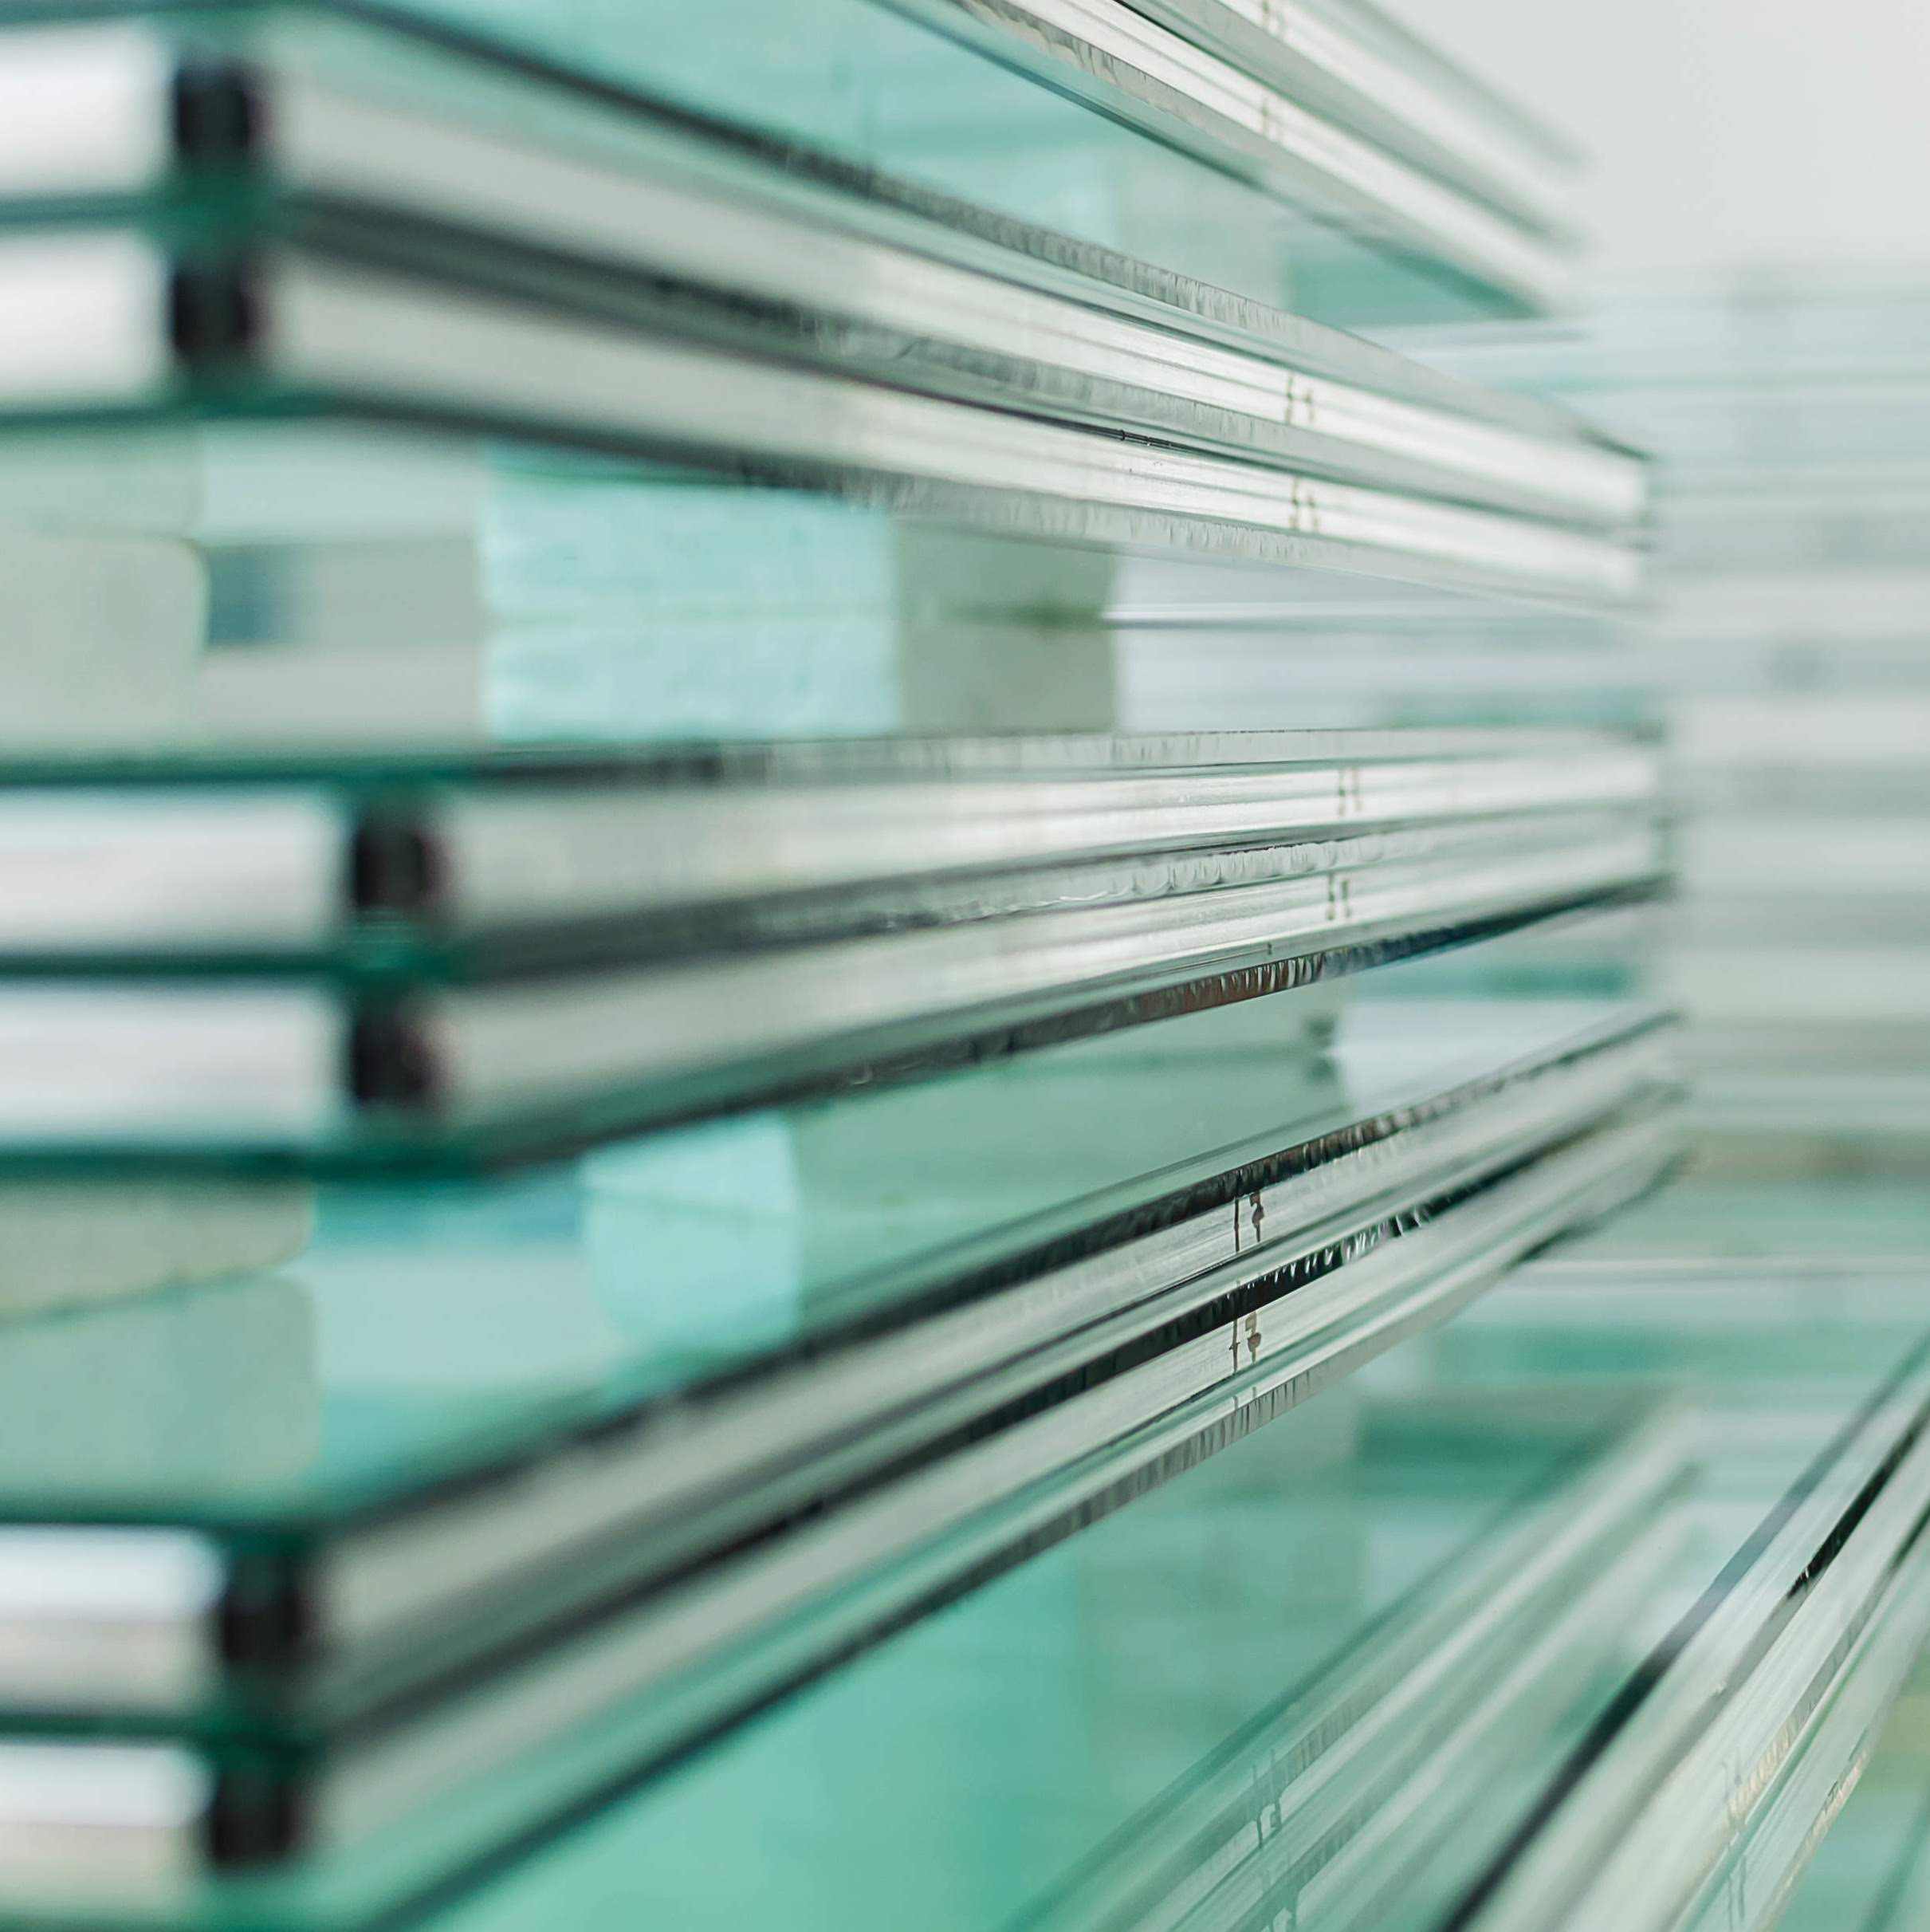 Lite - A single pane or piece of glass.